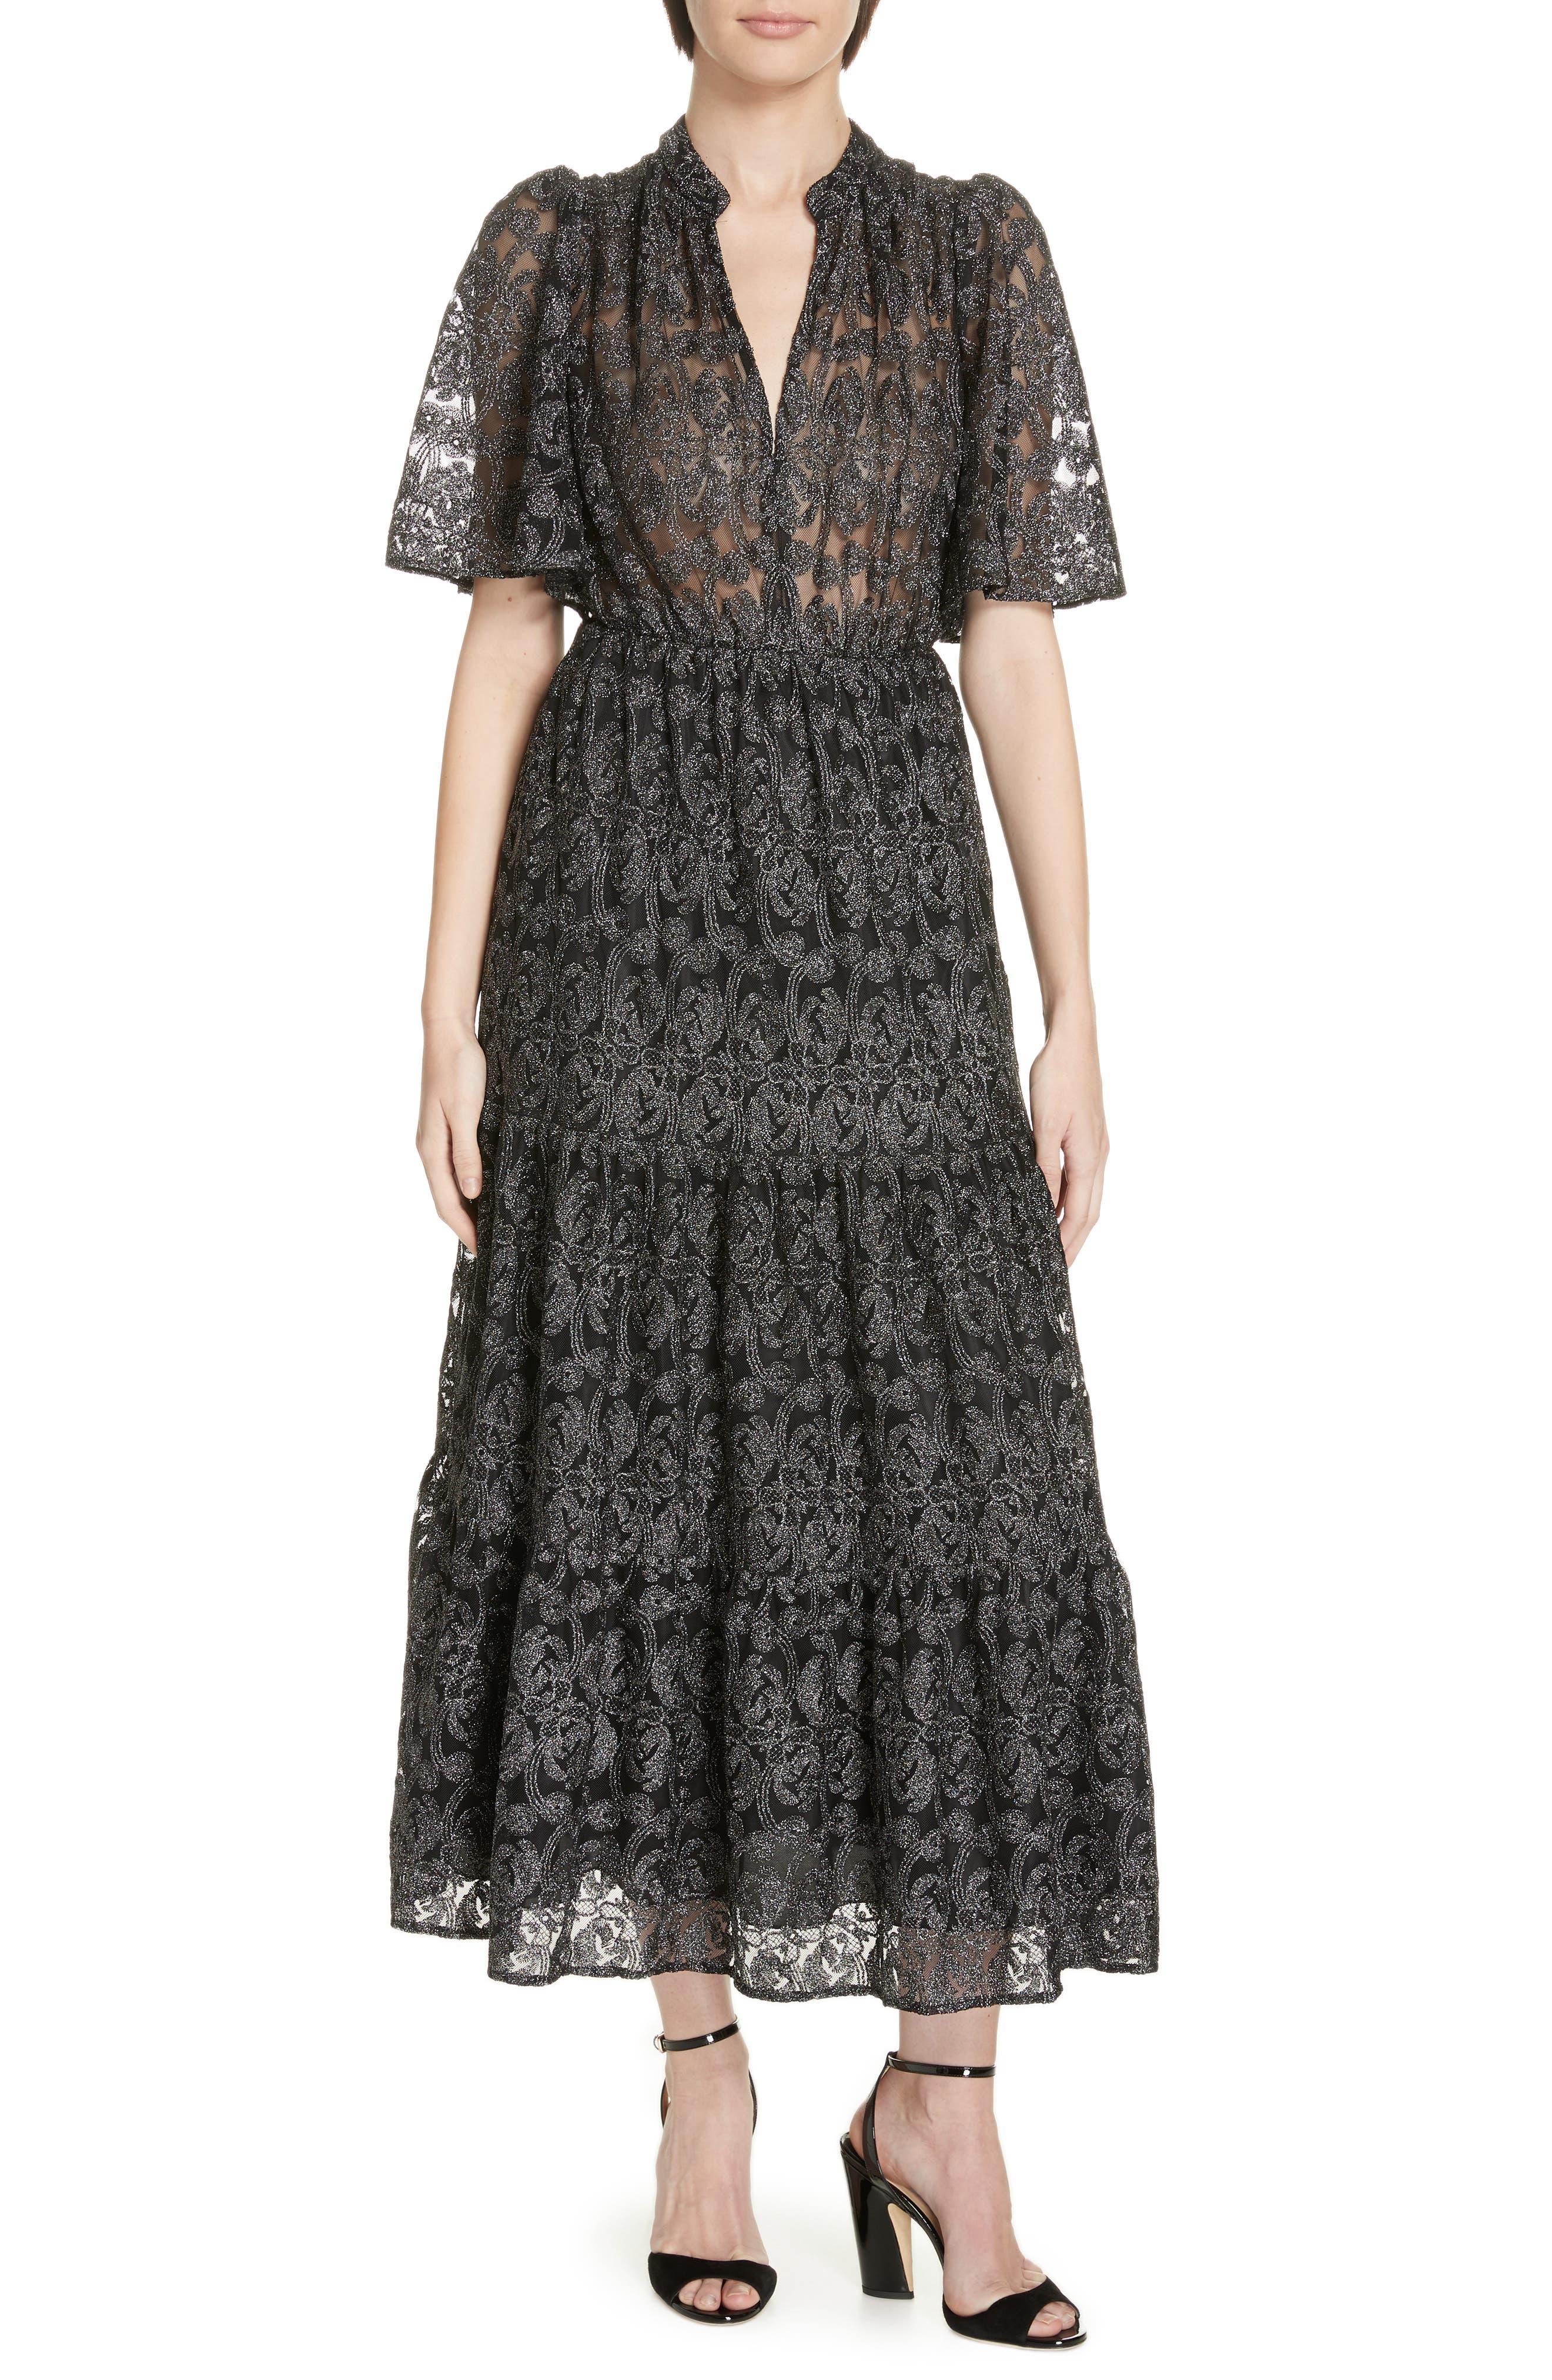 Kate Spade New York Metallic Embroidered Midi Dress, Black